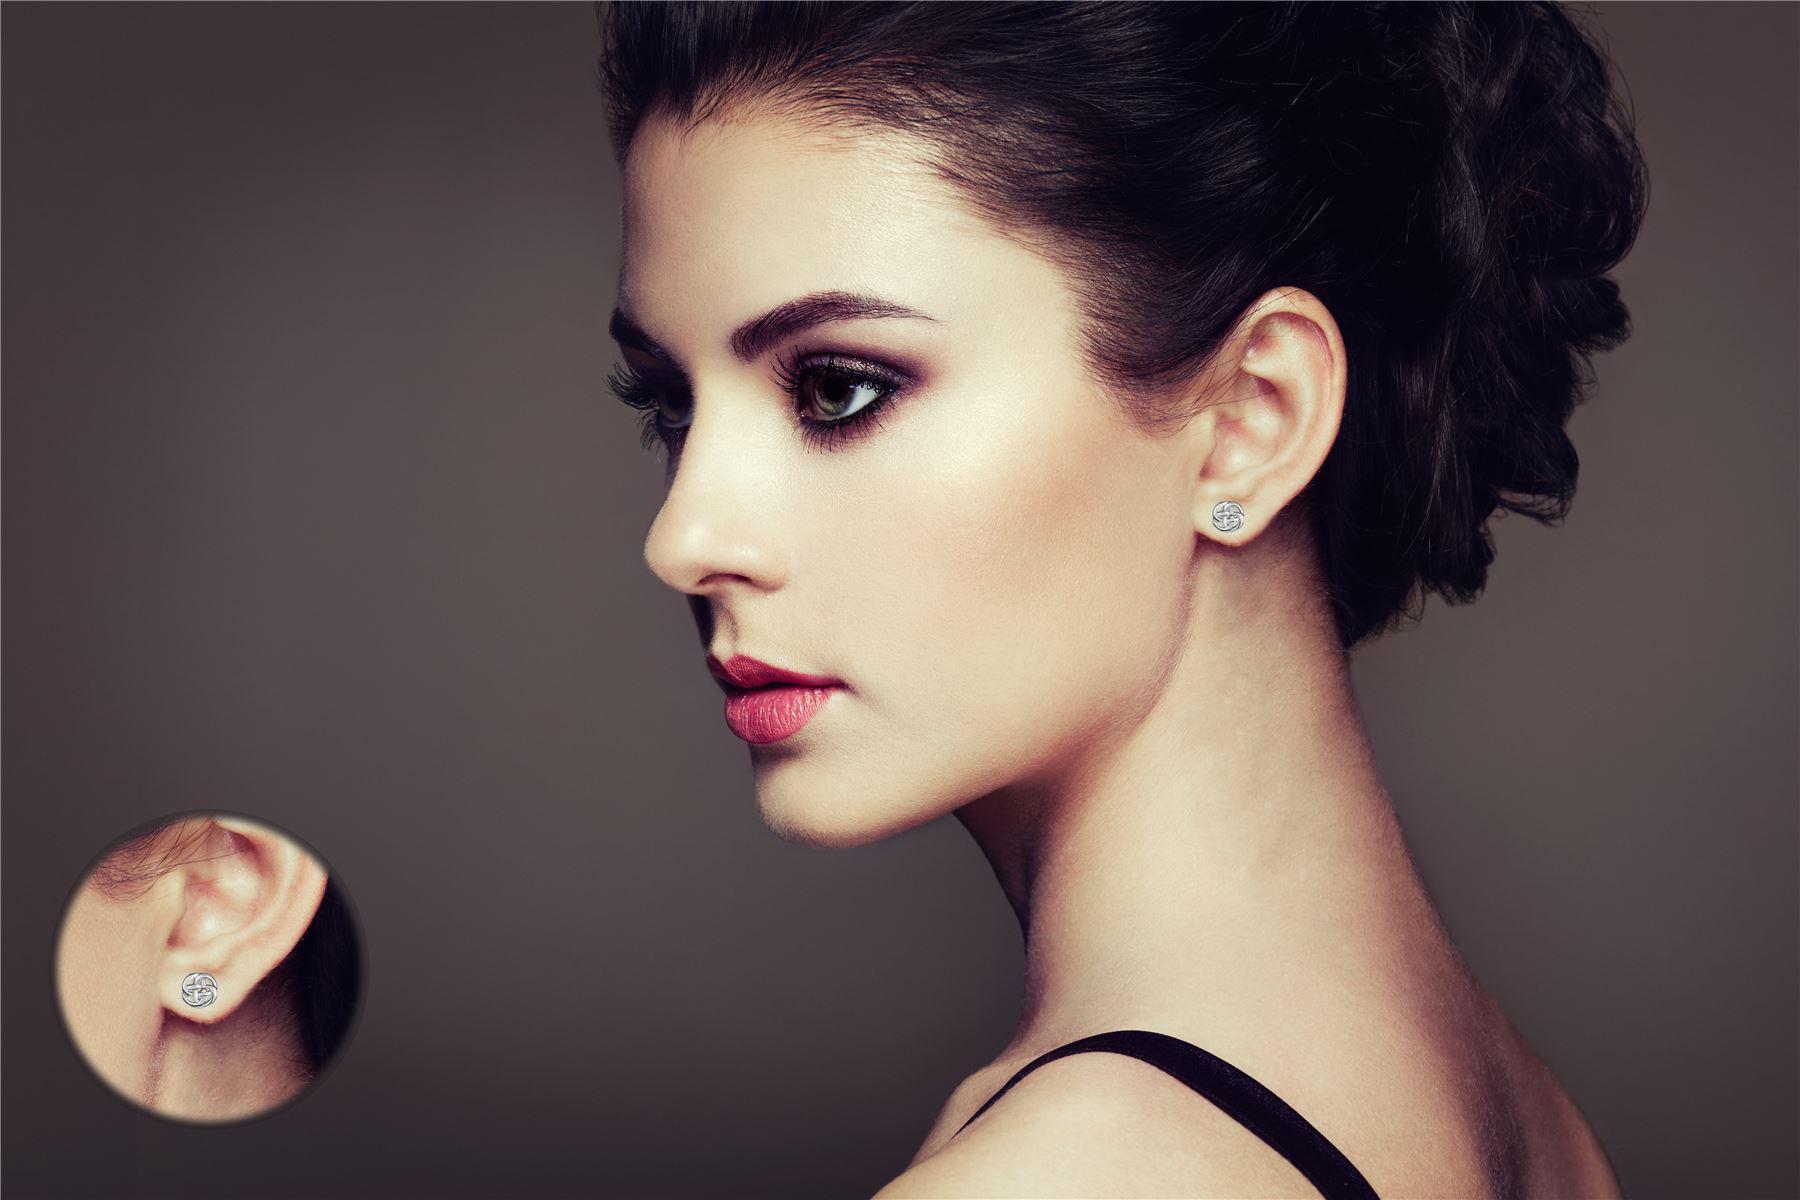 Amberta-925-Sterling-Silver-Celtic-Knot-Earrings-for-Women-Irish-Design miniature 5